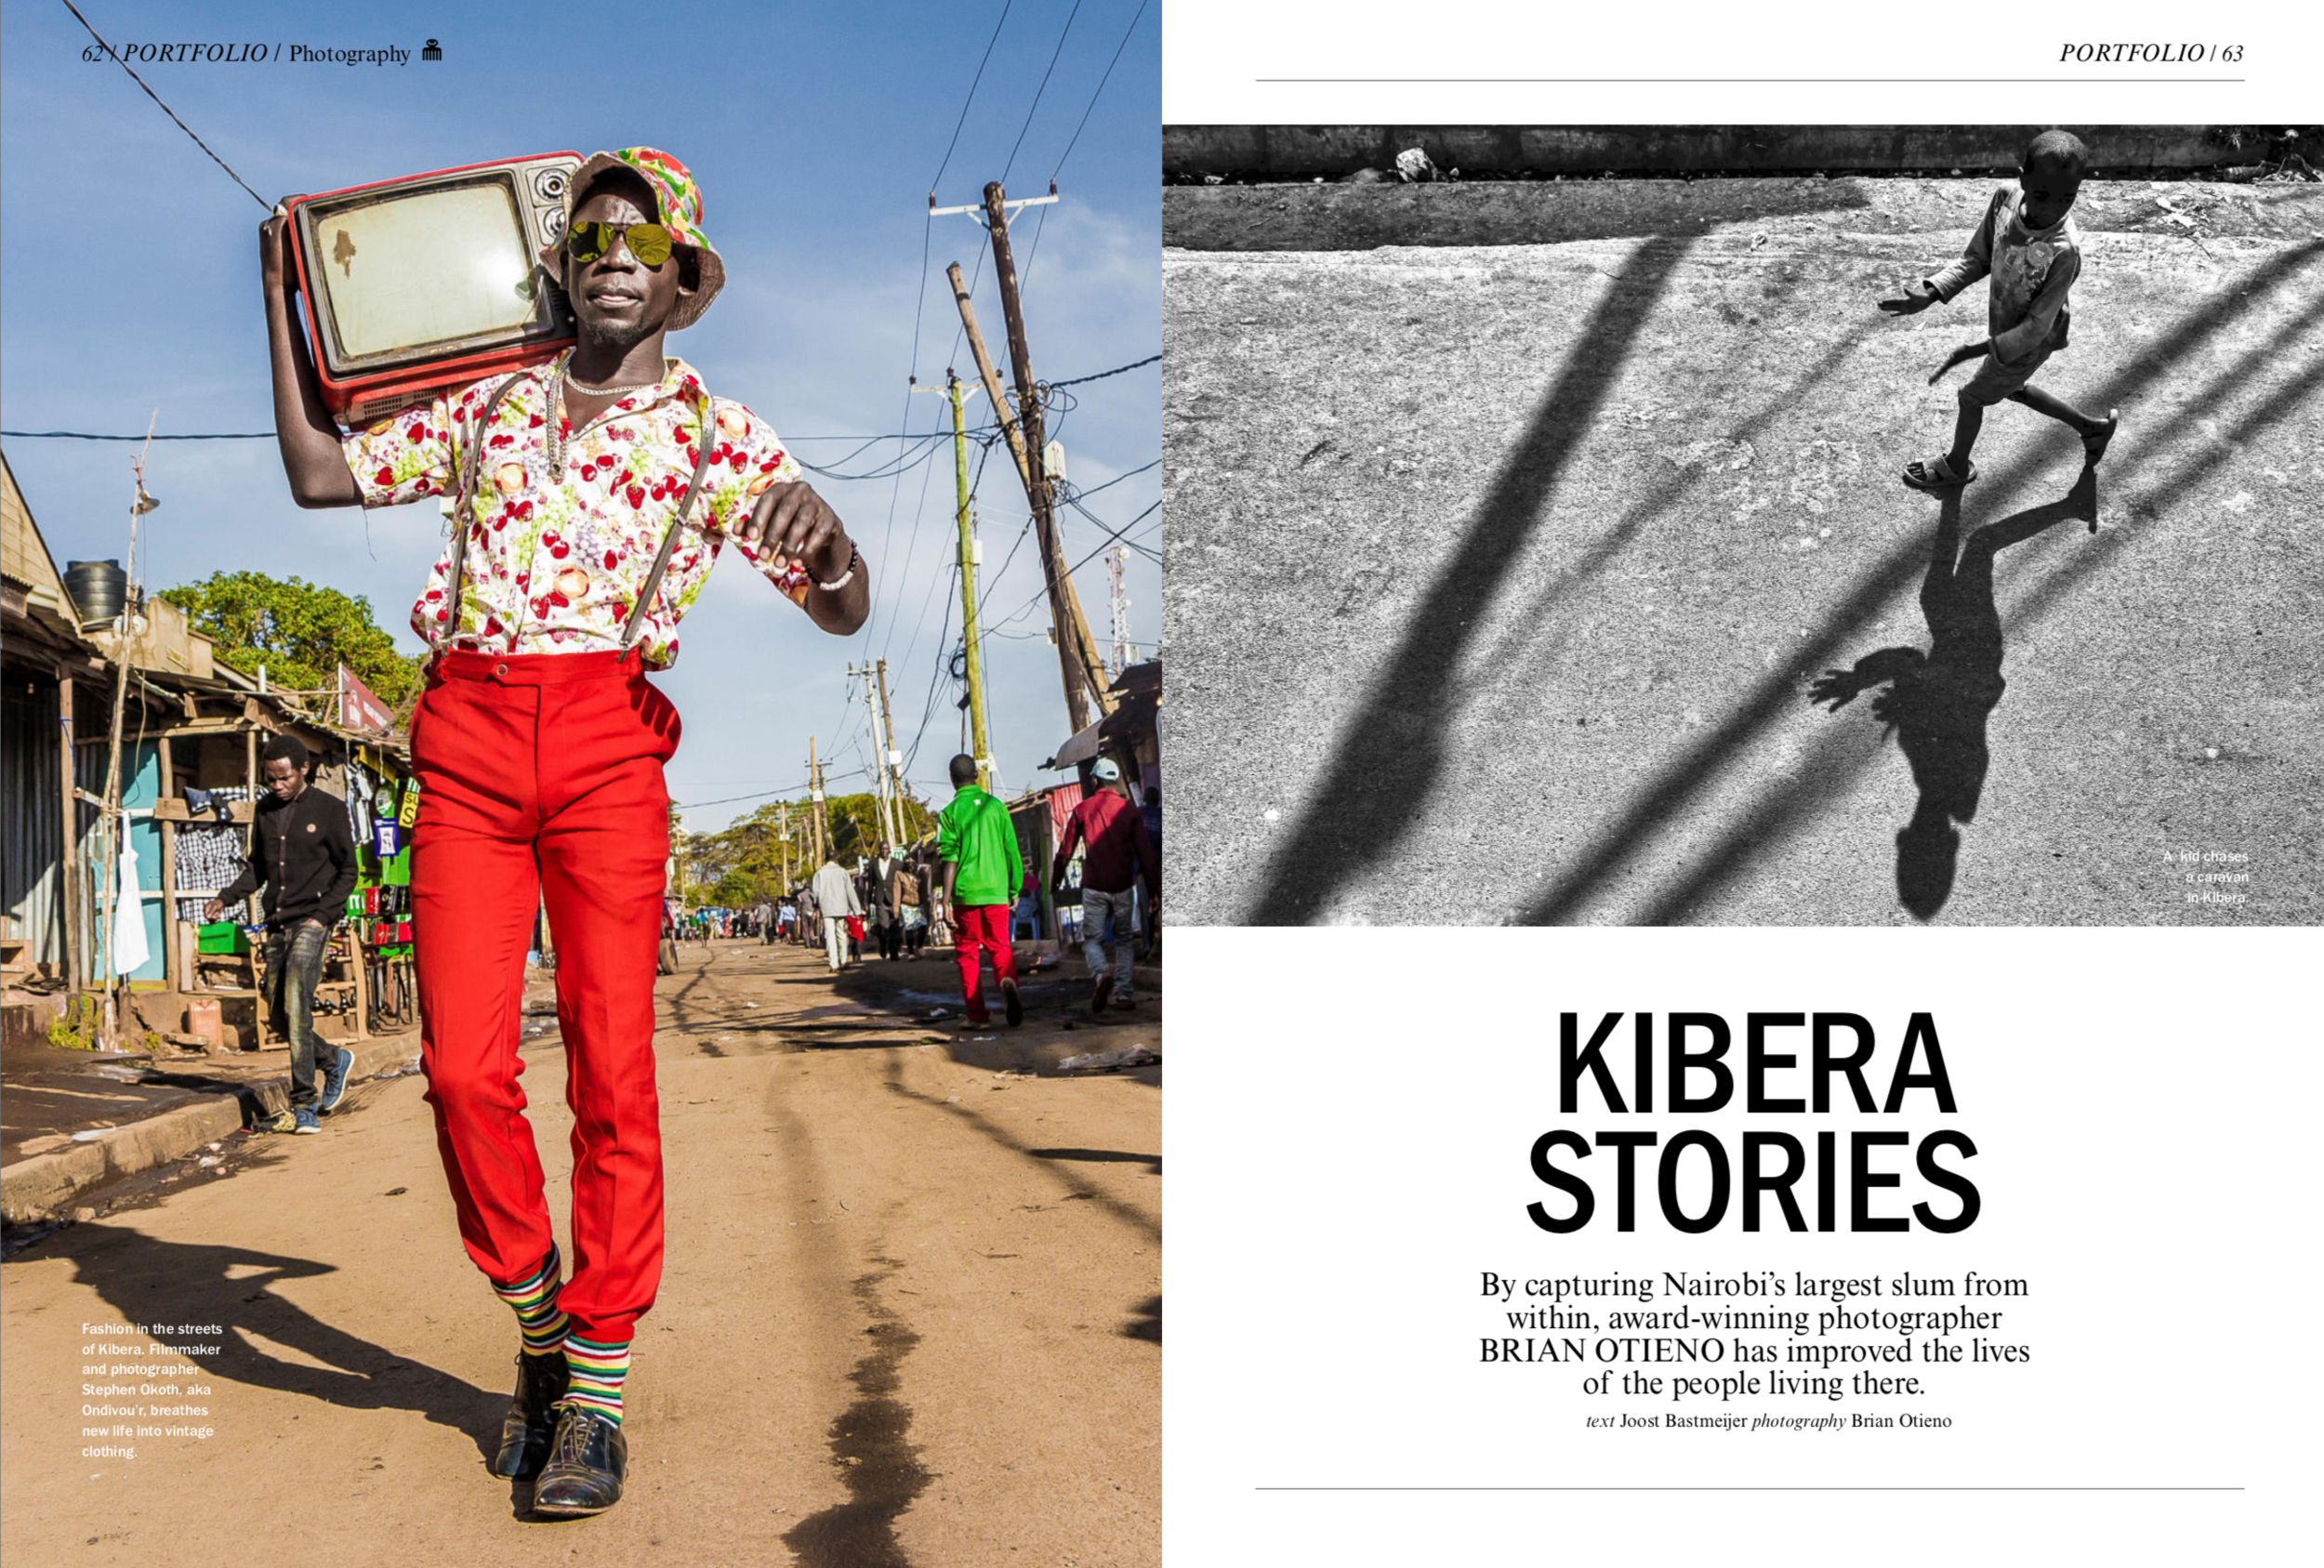 Msafiri - Brian Otieno - Storitellah - Kibera Stories - Interview by Joost Bastmeijer 2.png